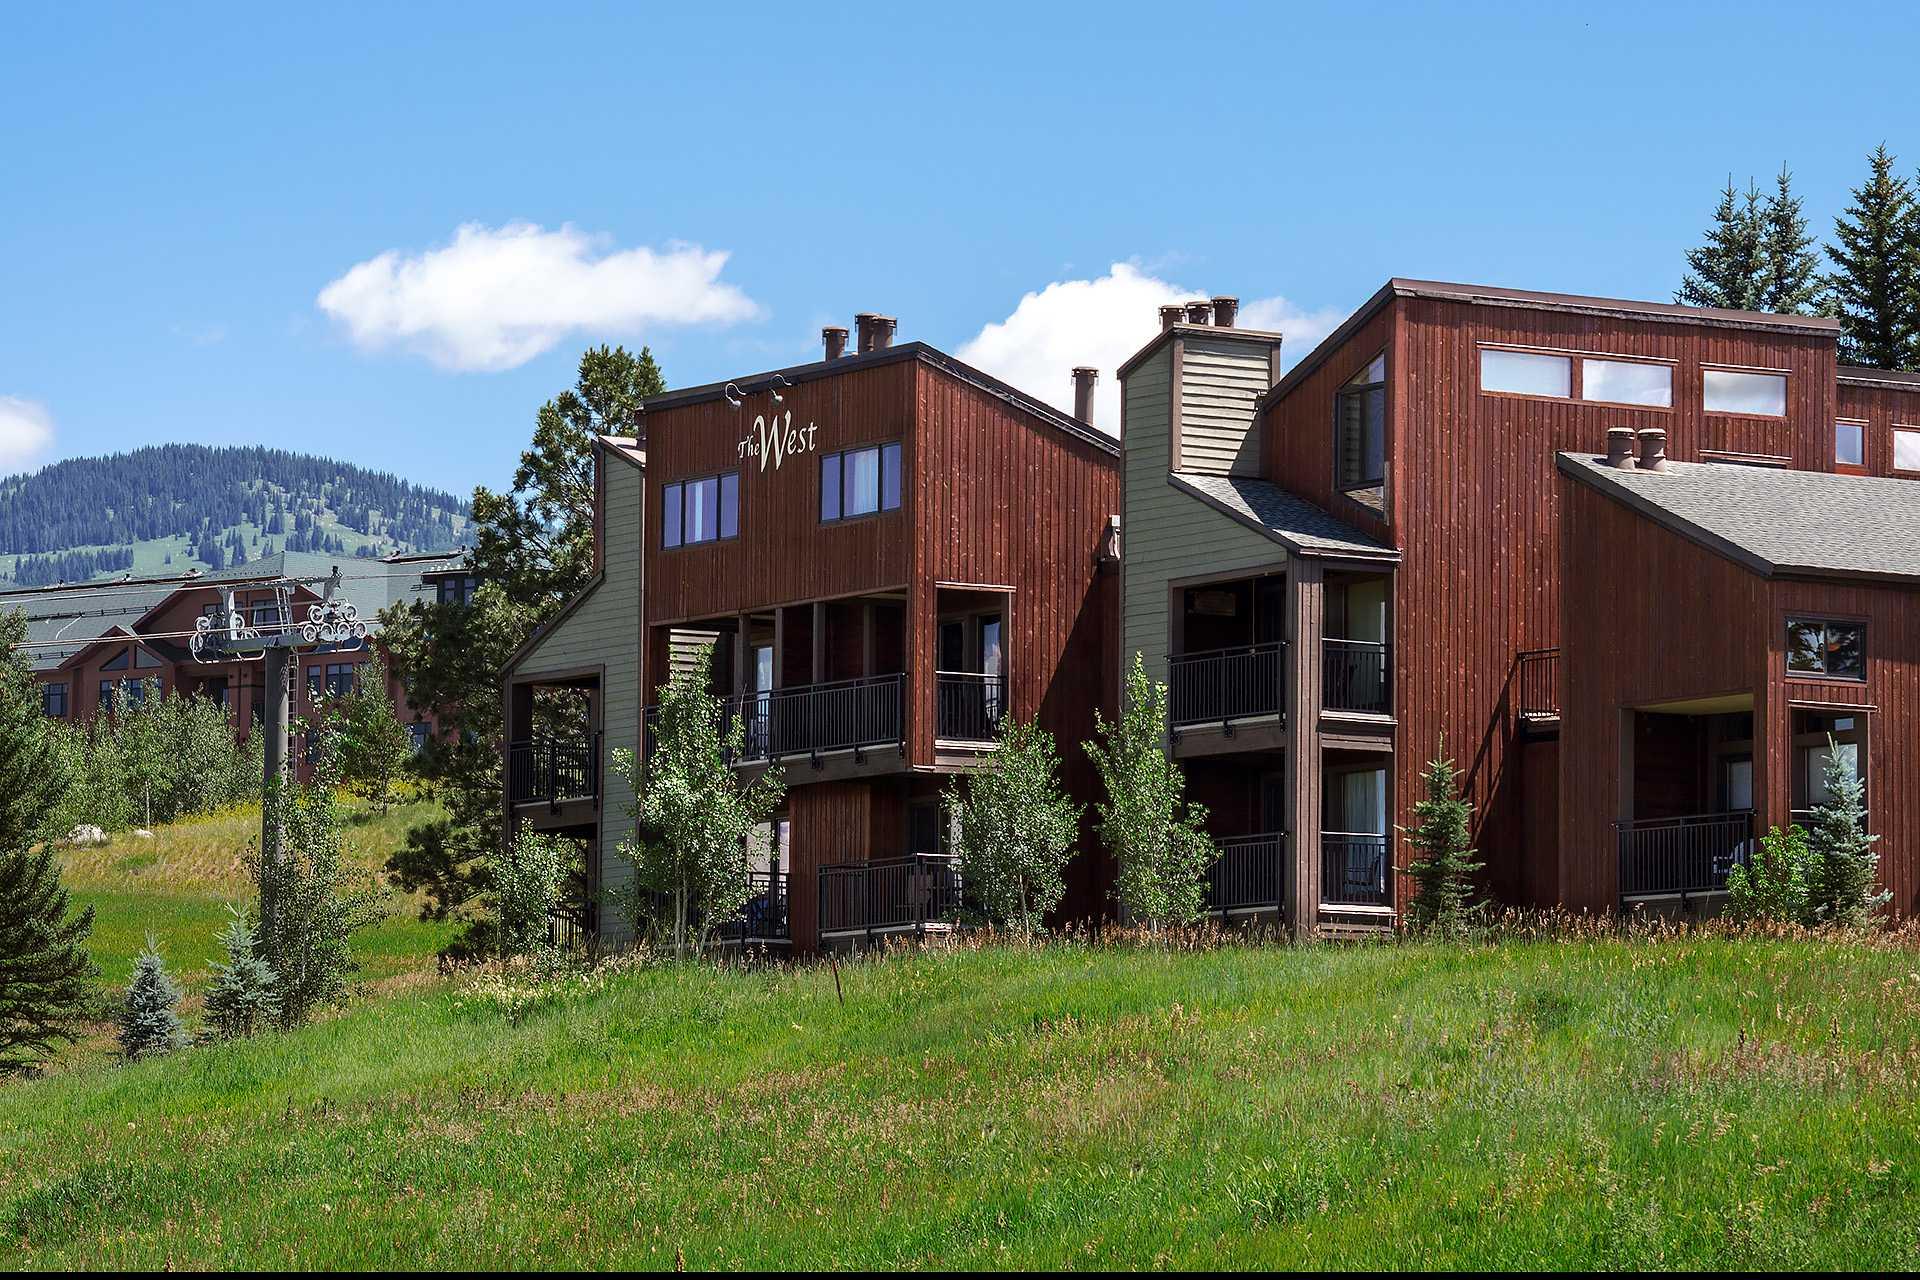 W3506: The West Condominiums